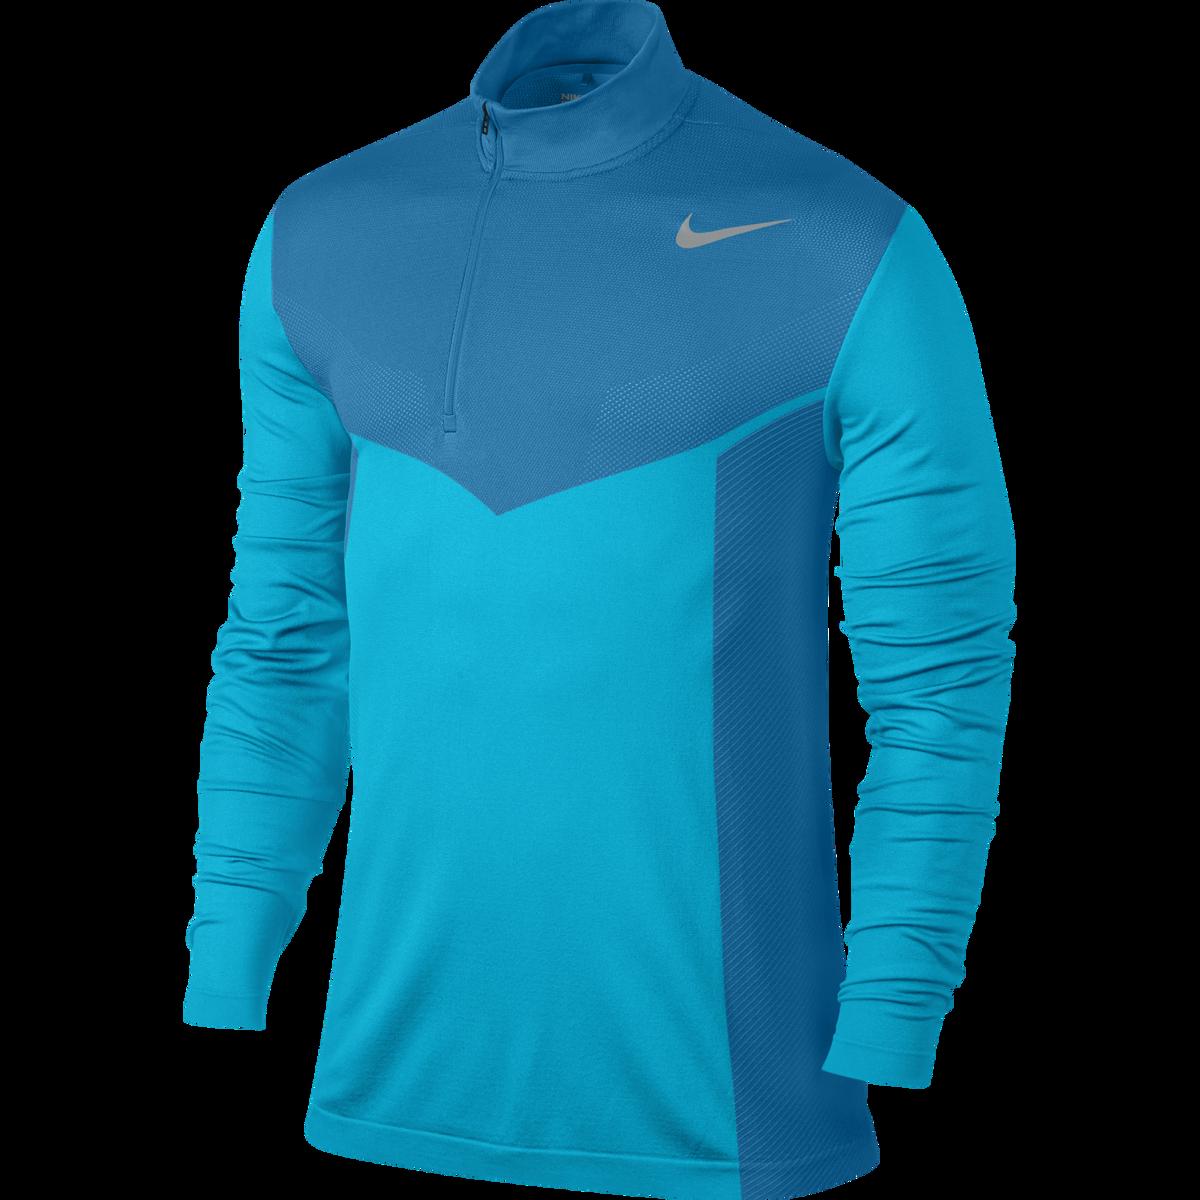 040253908ce48 Nike Dry Knit Half Zip Top